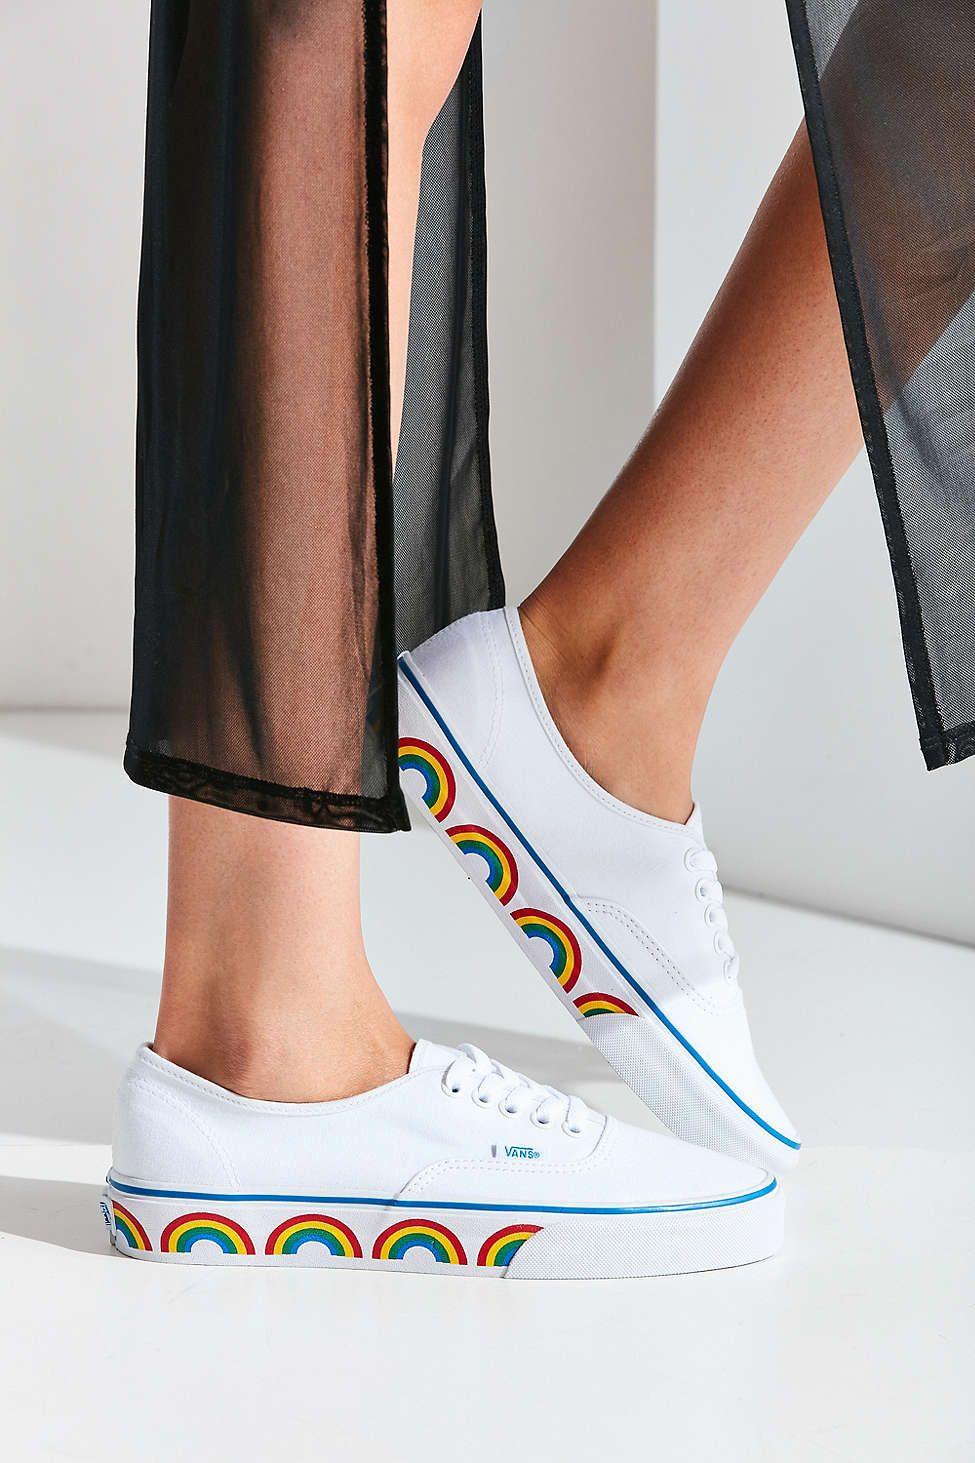 a06dc04c499e Vans Authentic Rainbow Sole Sneaker in 2019